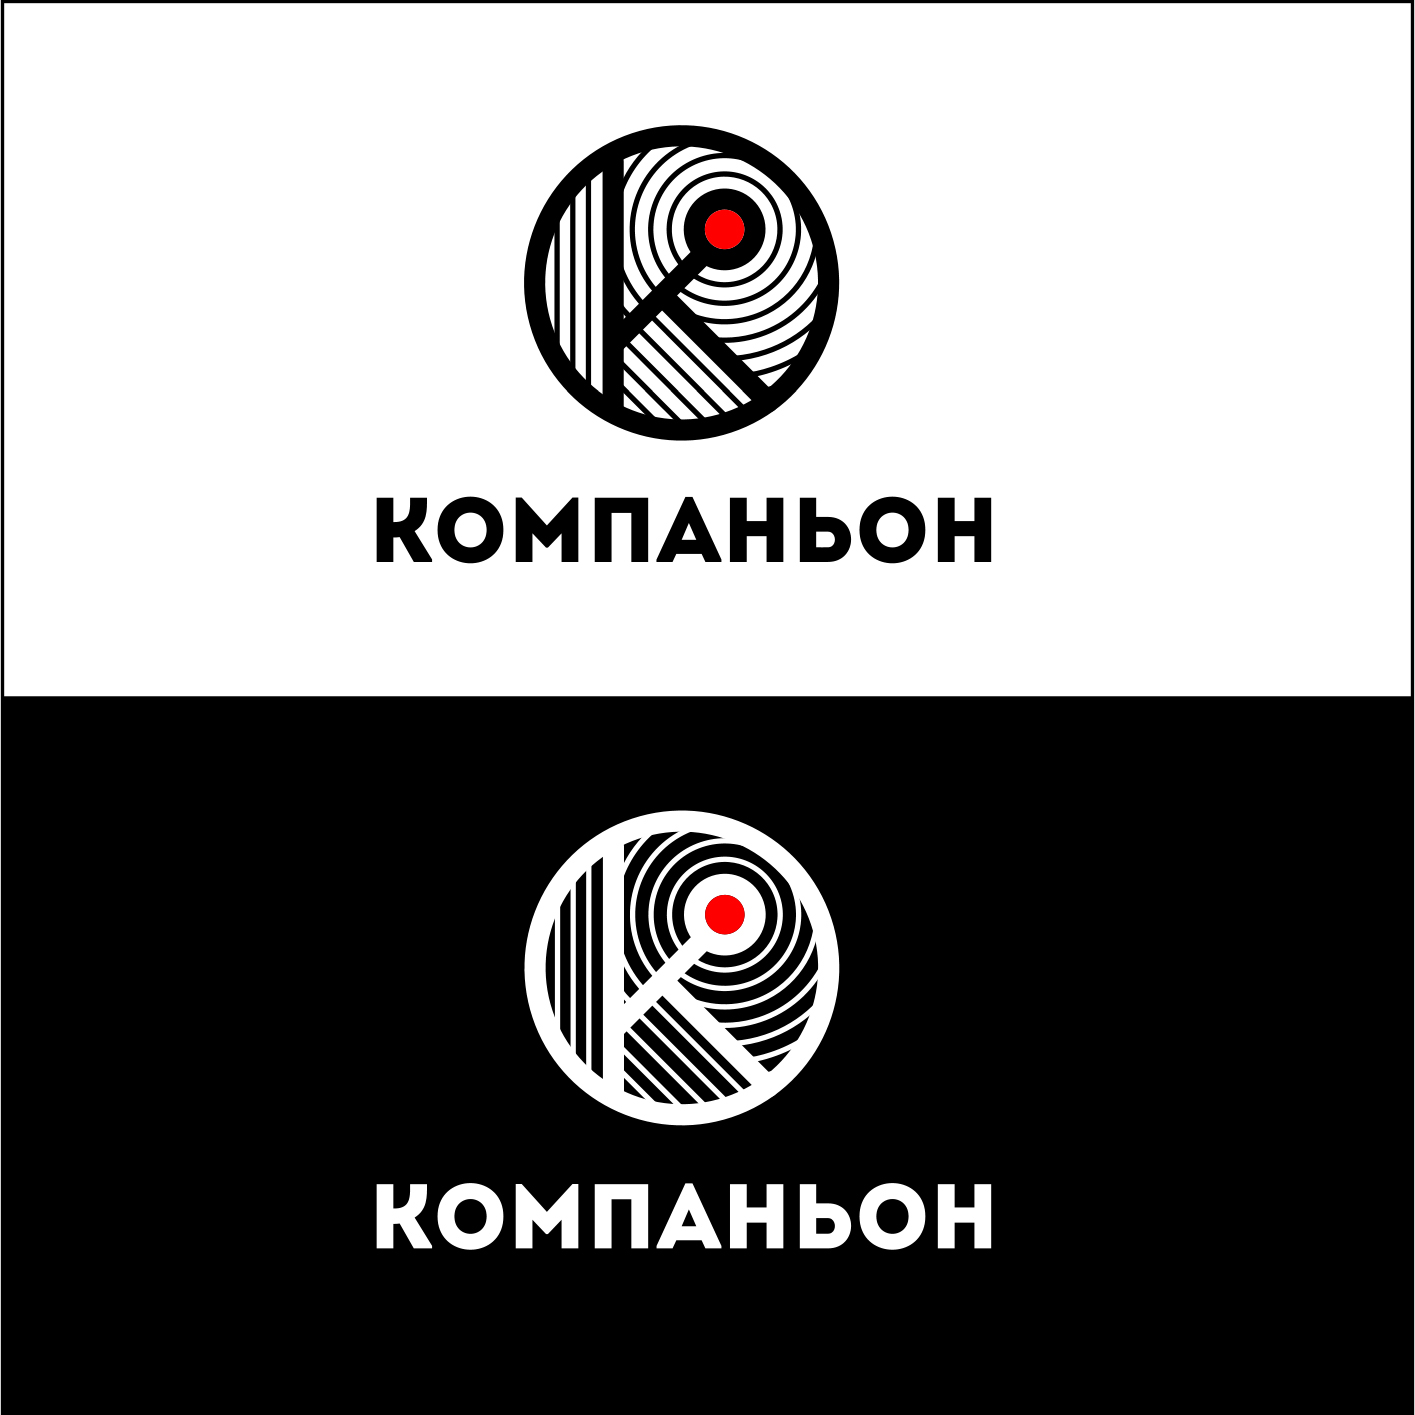 Логотип компании фото f_1975b923786a99f4.jpg